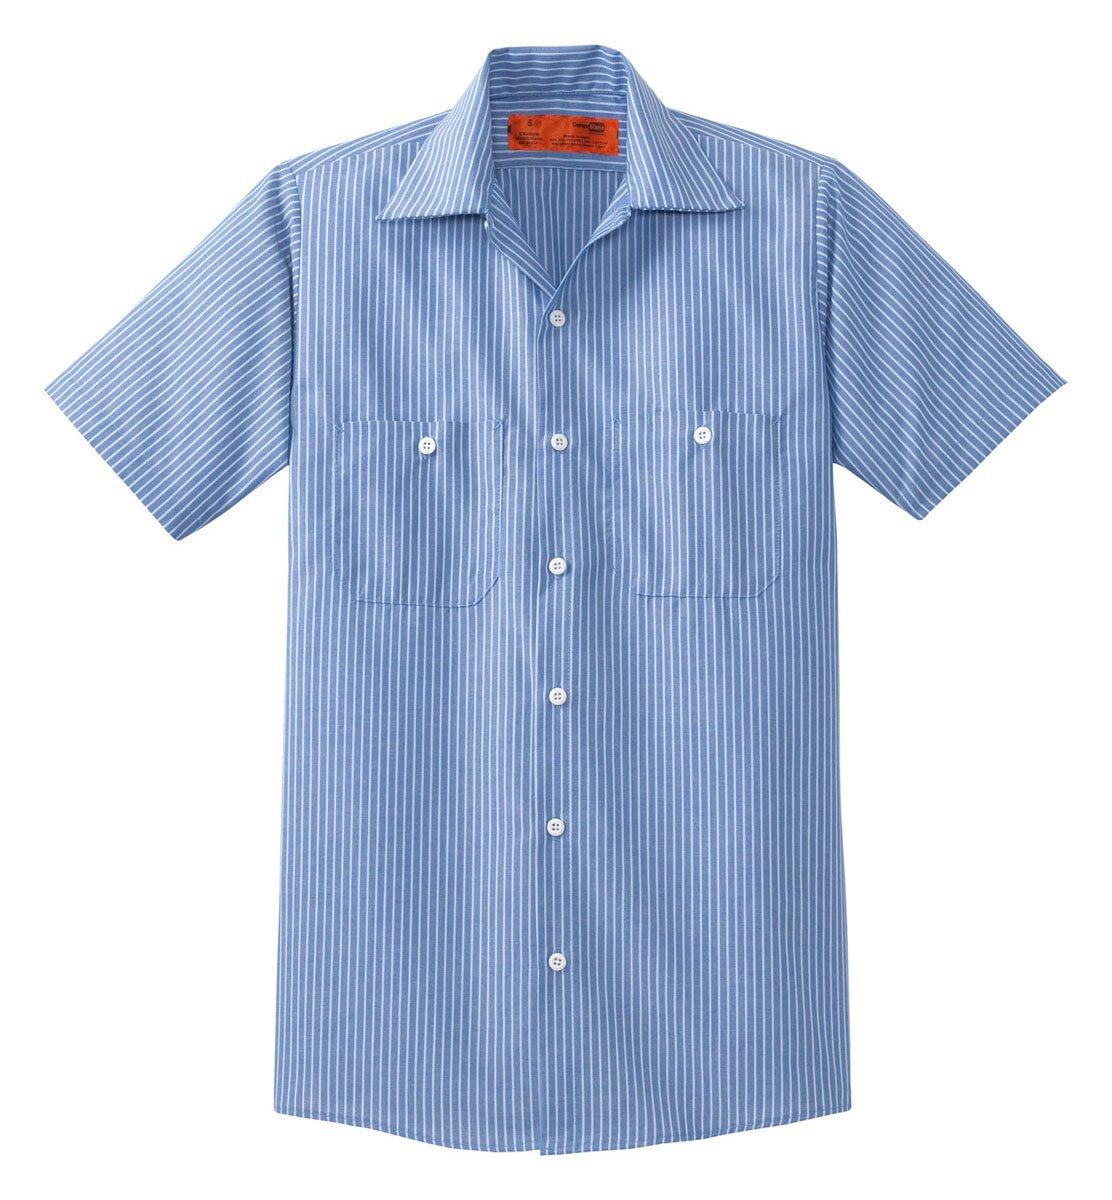 CornerStone - Short Sleeve Striped Industrial Work Shirt. CS20 - Blue/White_L Reg by Cornerstone